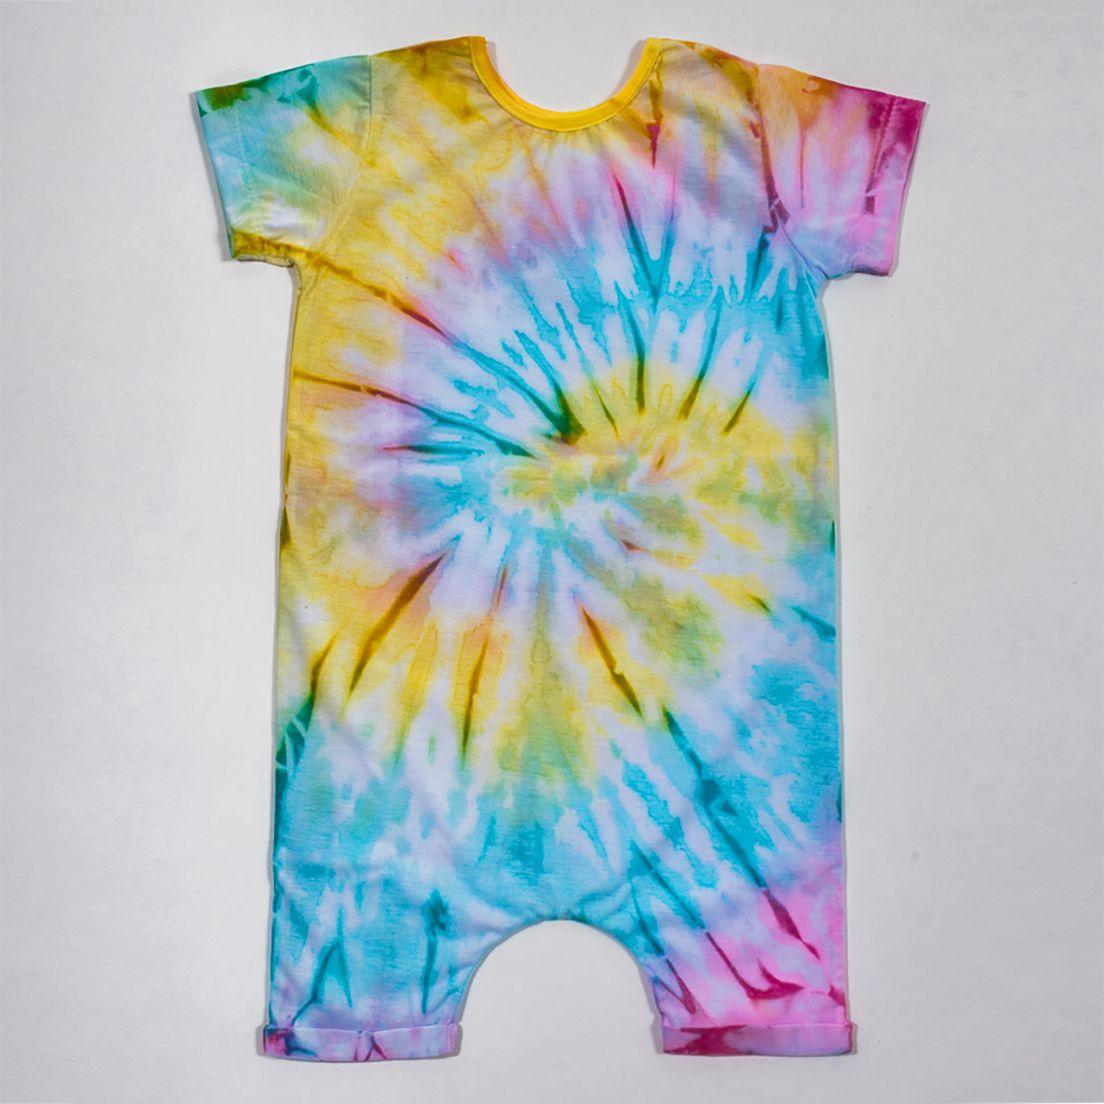 Macacão Curto Comfy Tie Dye